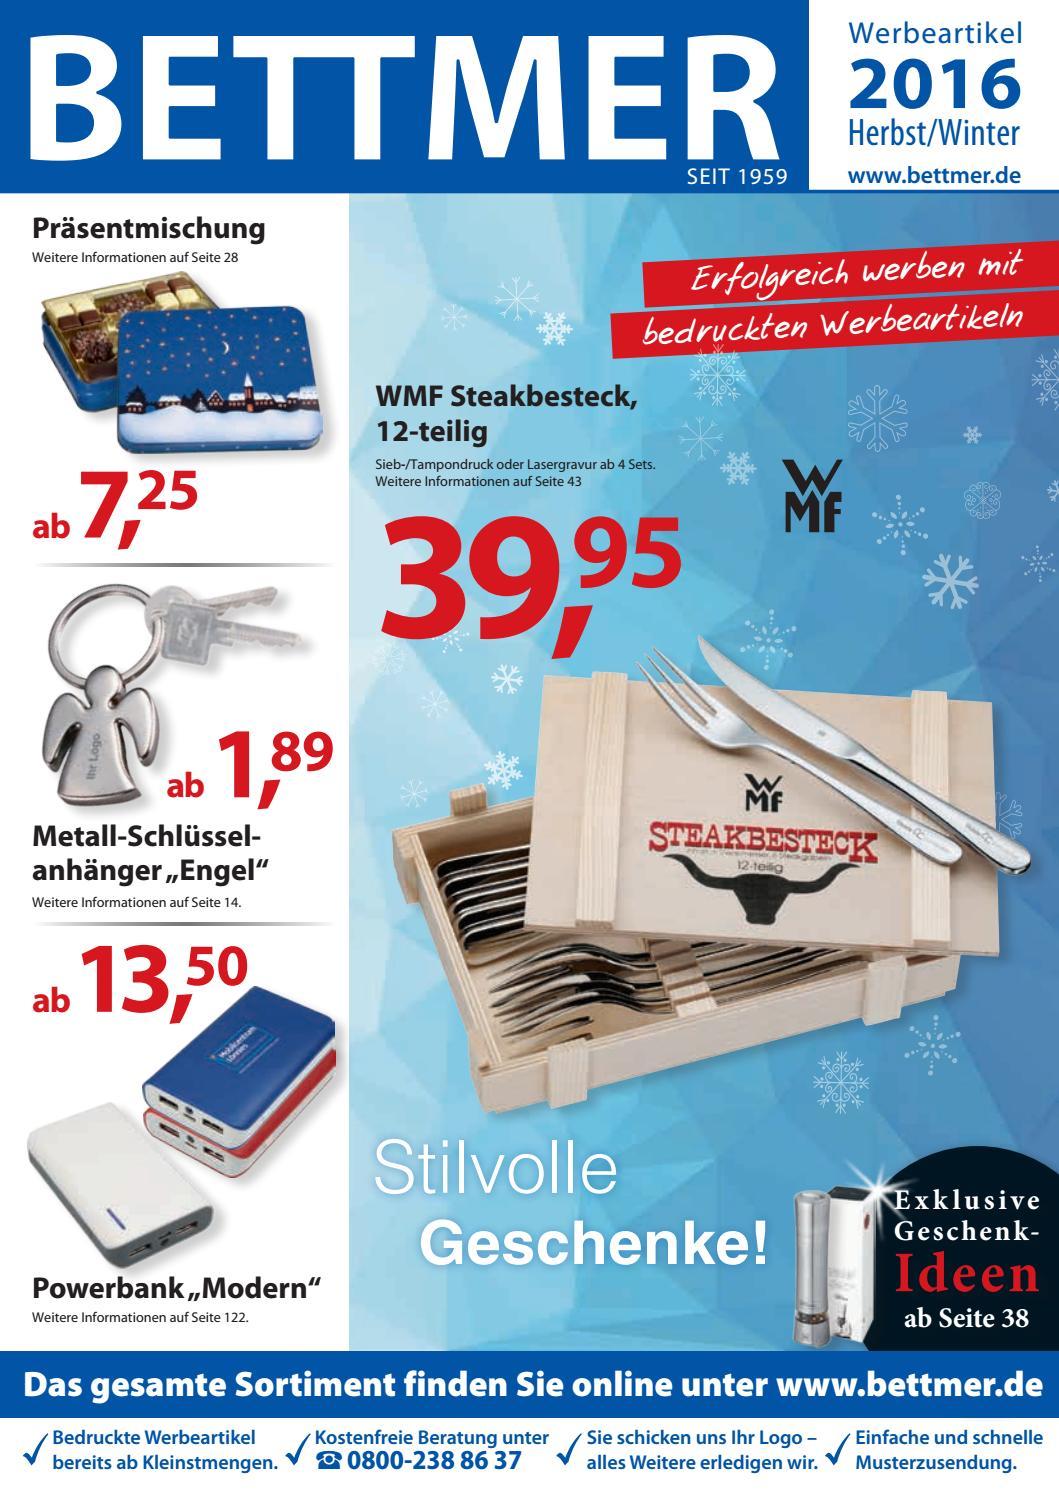 Bettmer Werbeartikel Winterkatalog 2016 By Gmbh Issuu De Luxe Timer With Ic 4093 7808